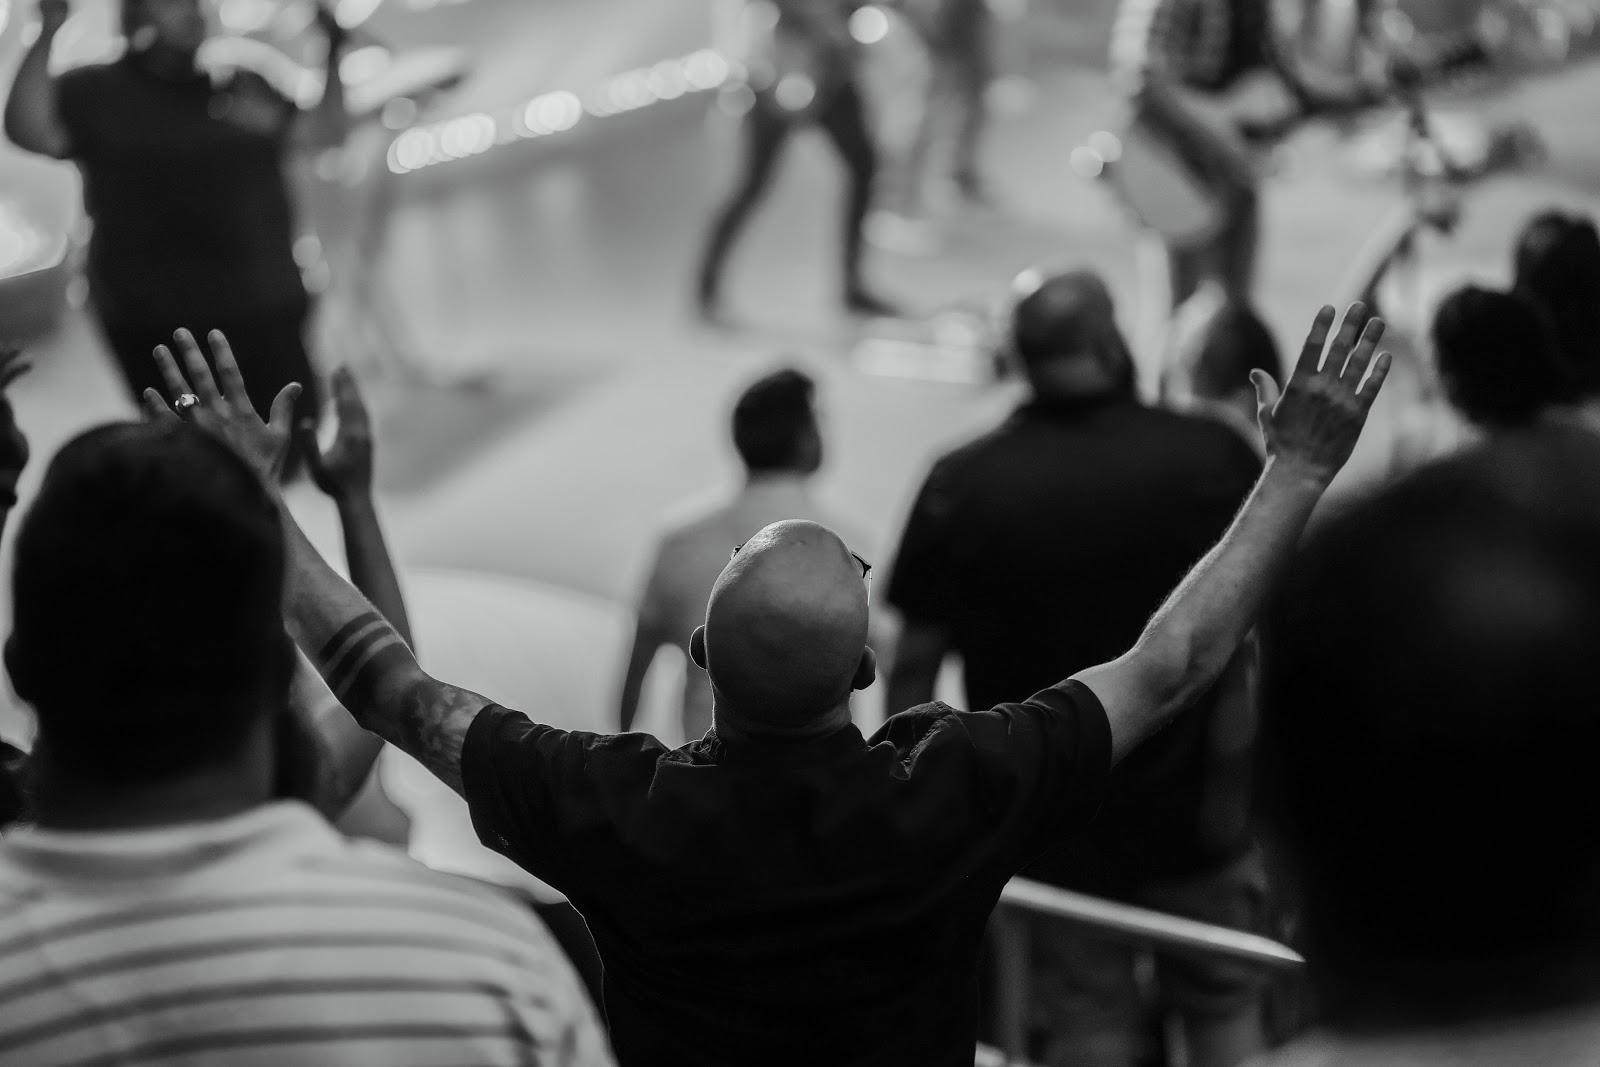 man worshipping in crowd at church in omaha nebraska